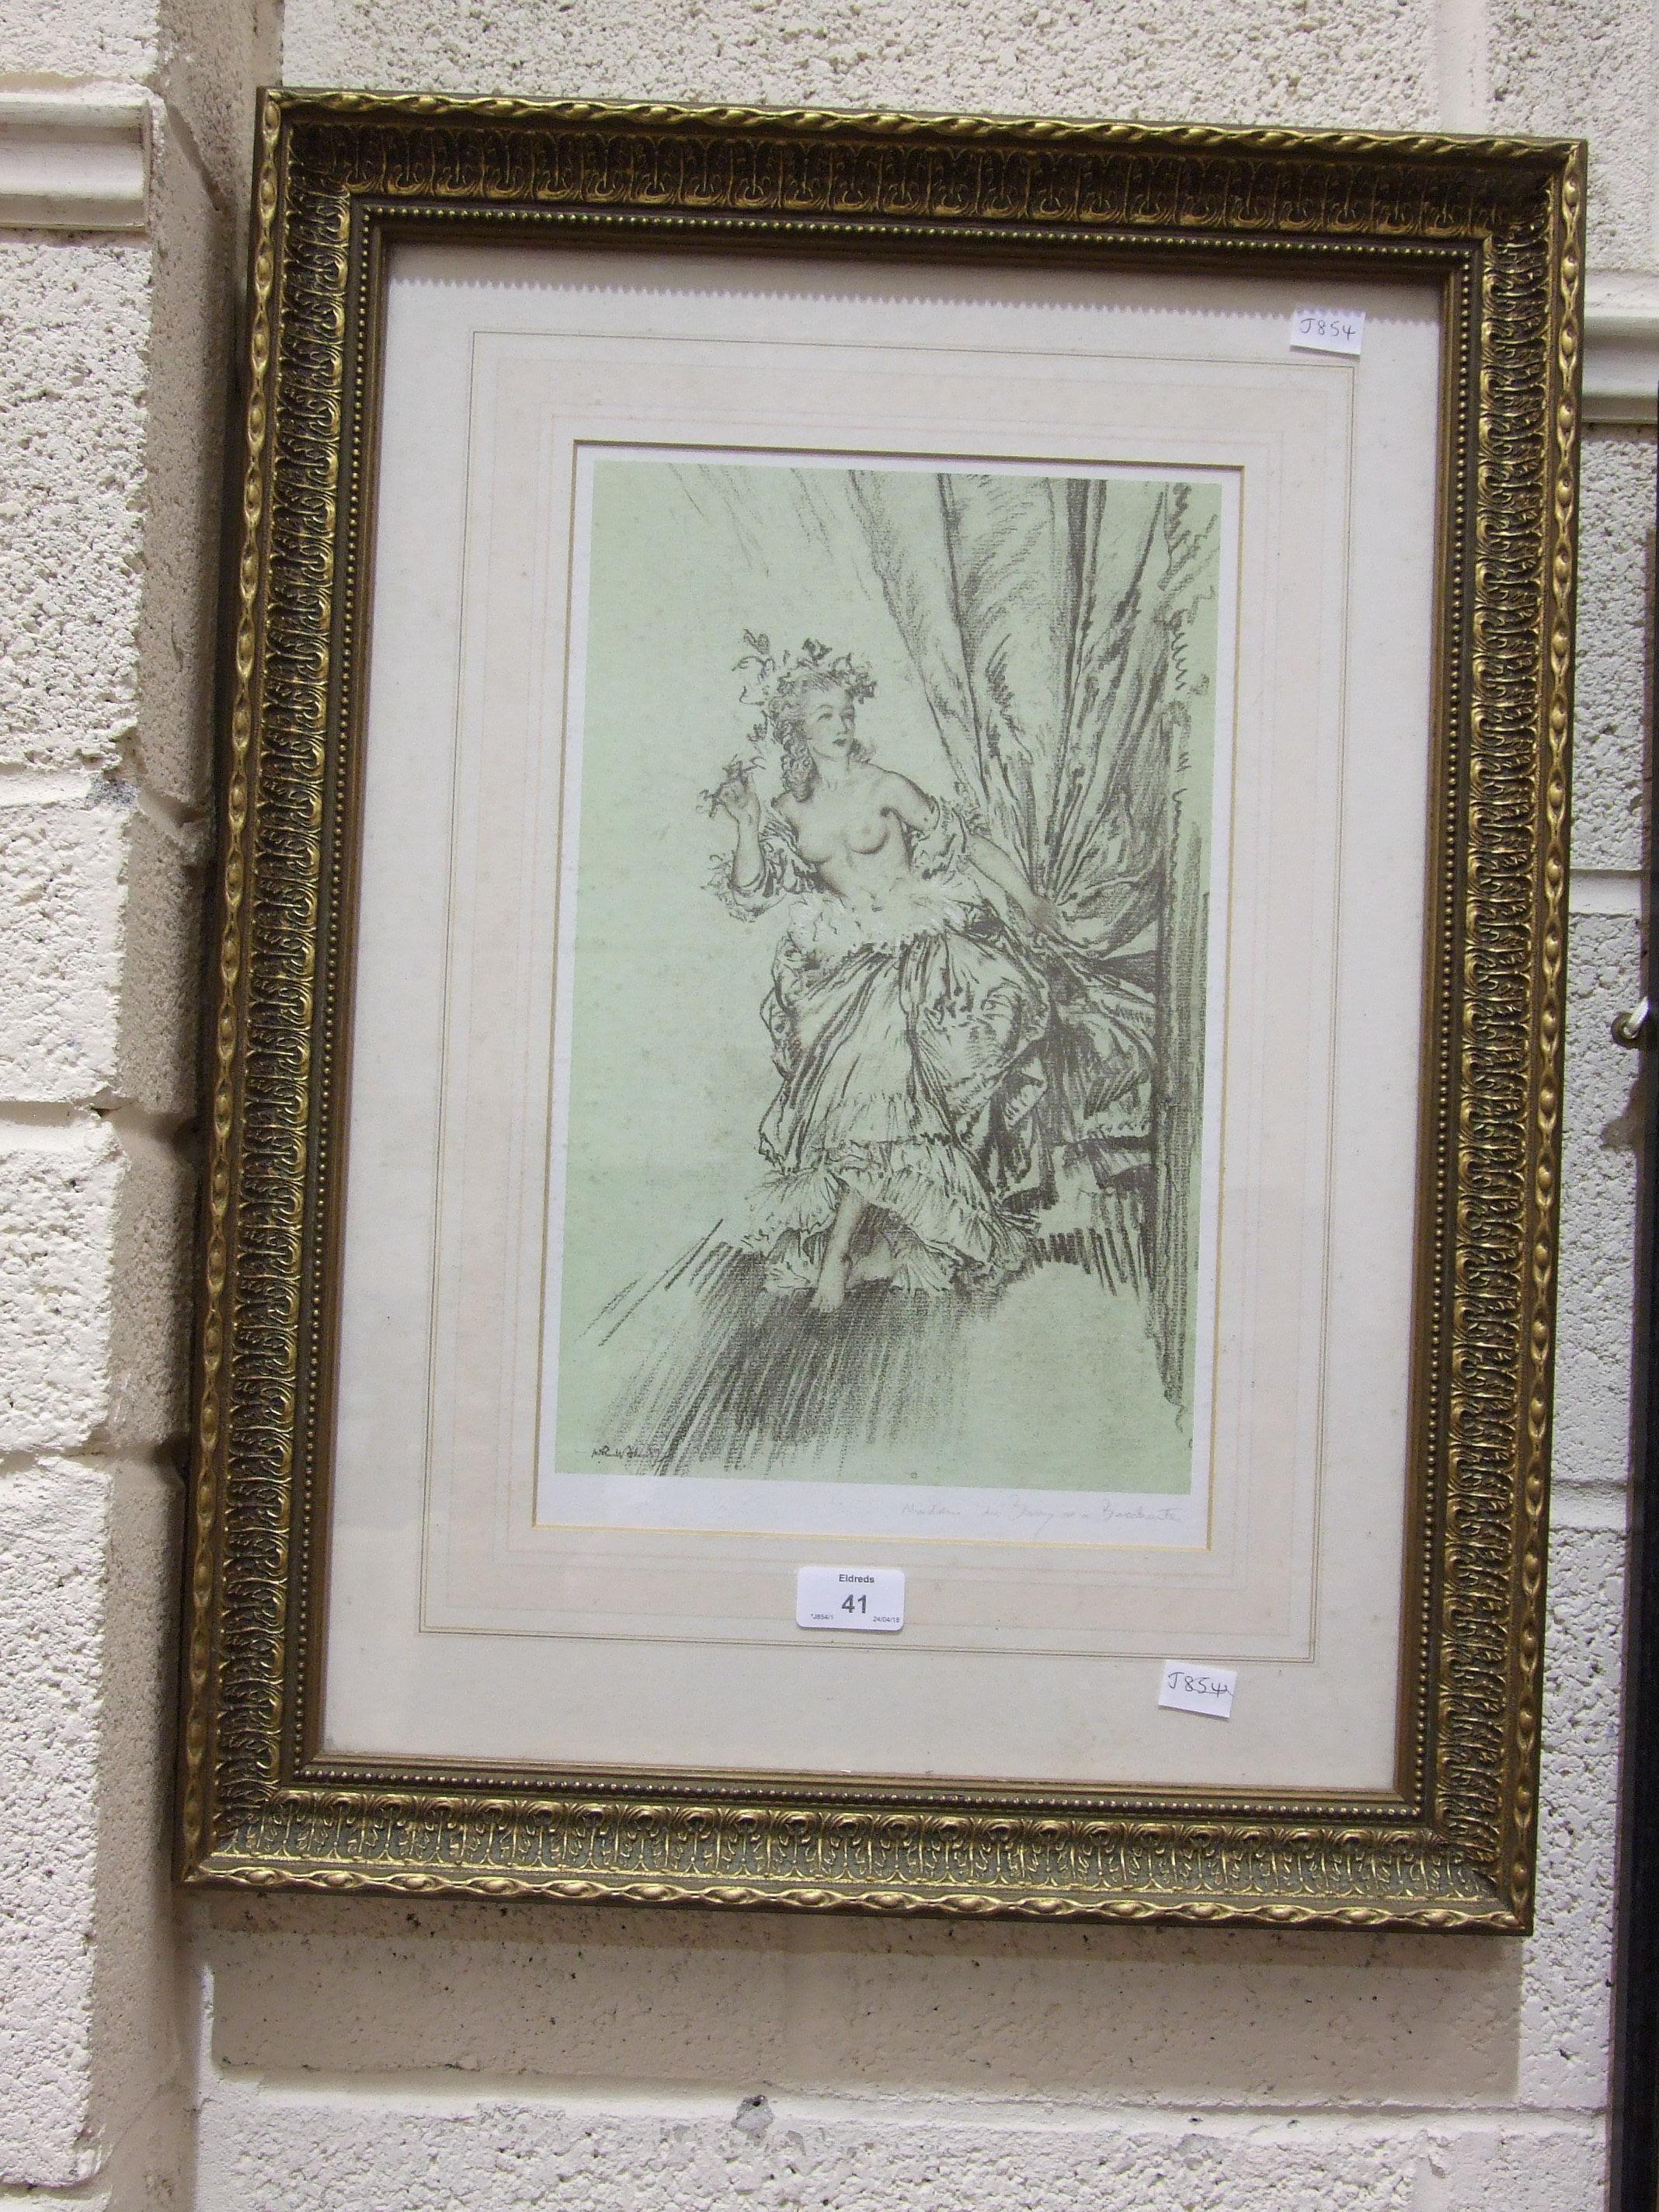 Lot 41 - After Sir William Russell Flint, 'Madame Du Barry, The Reclining Beauty', a framed print, 39 x